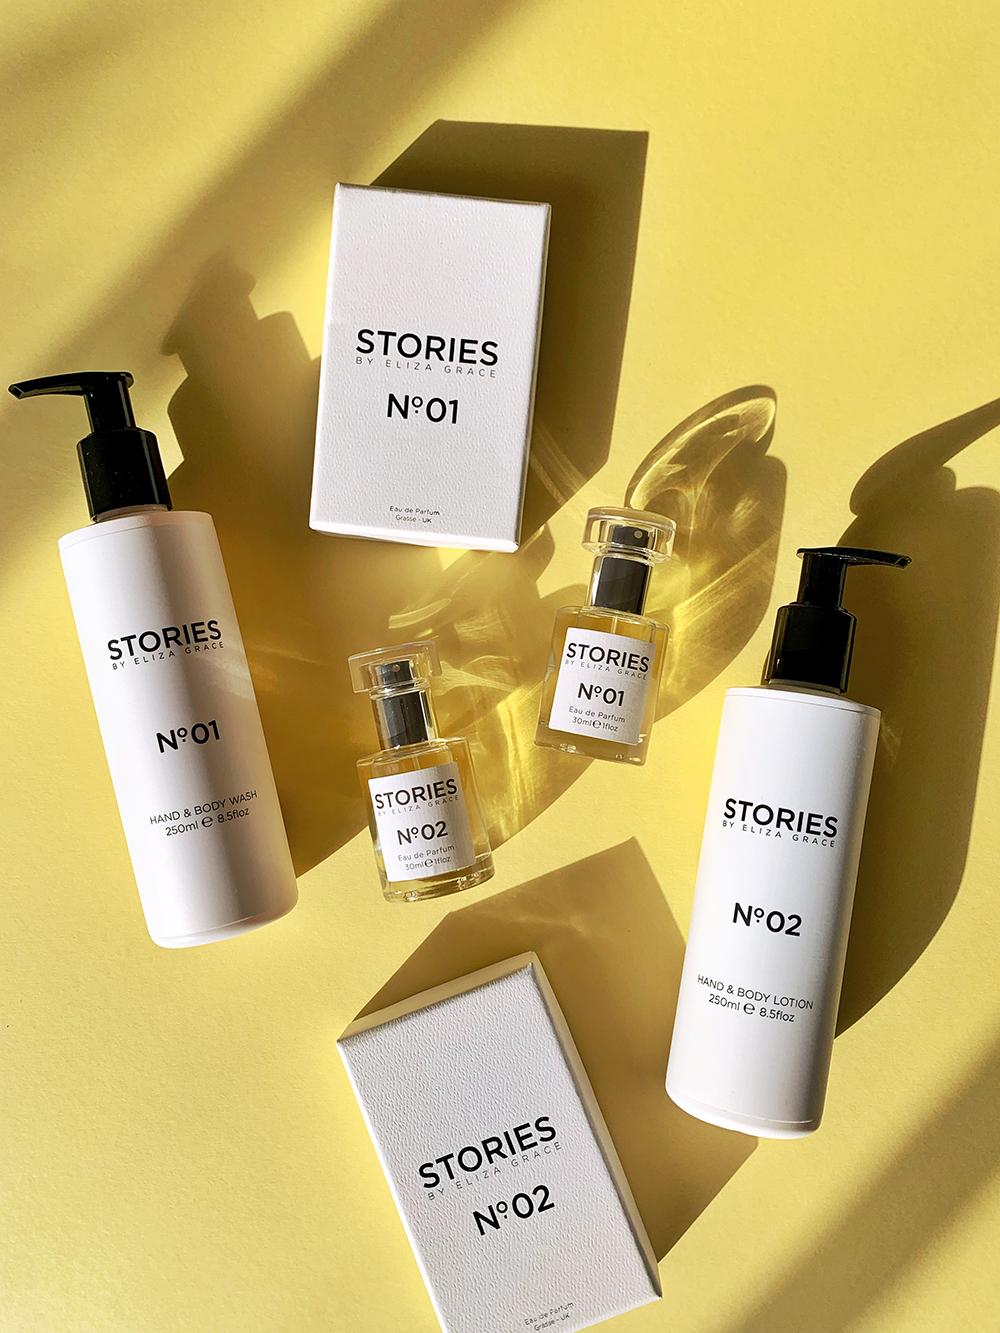 Stories Parfums, luxury fragrance brand - London beauty & style blog